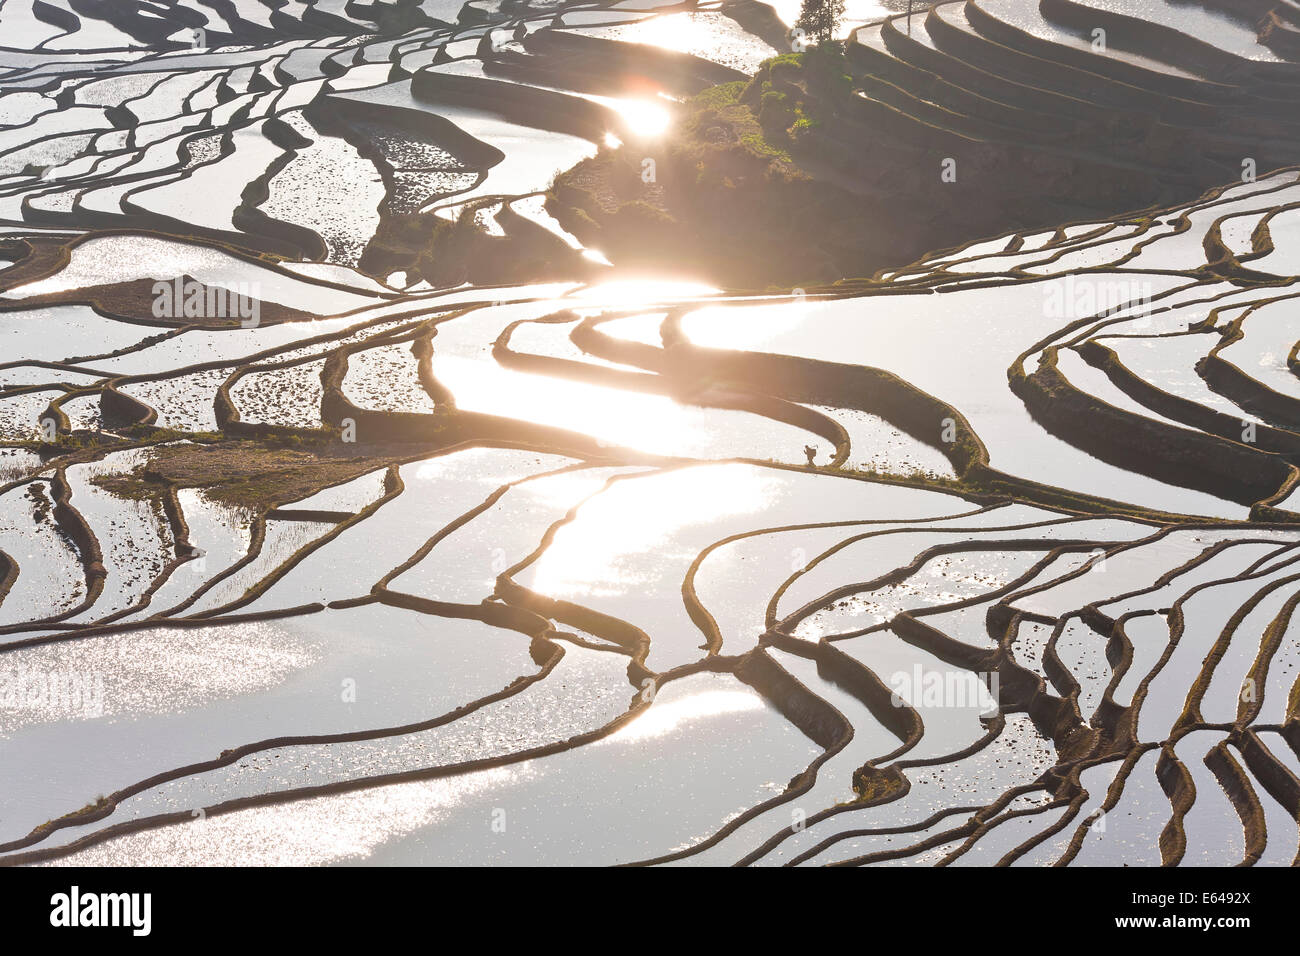 Reflections off water filled rice terraces, Yuanyang County, Honghe, Yunnan Province, China Stock Photo